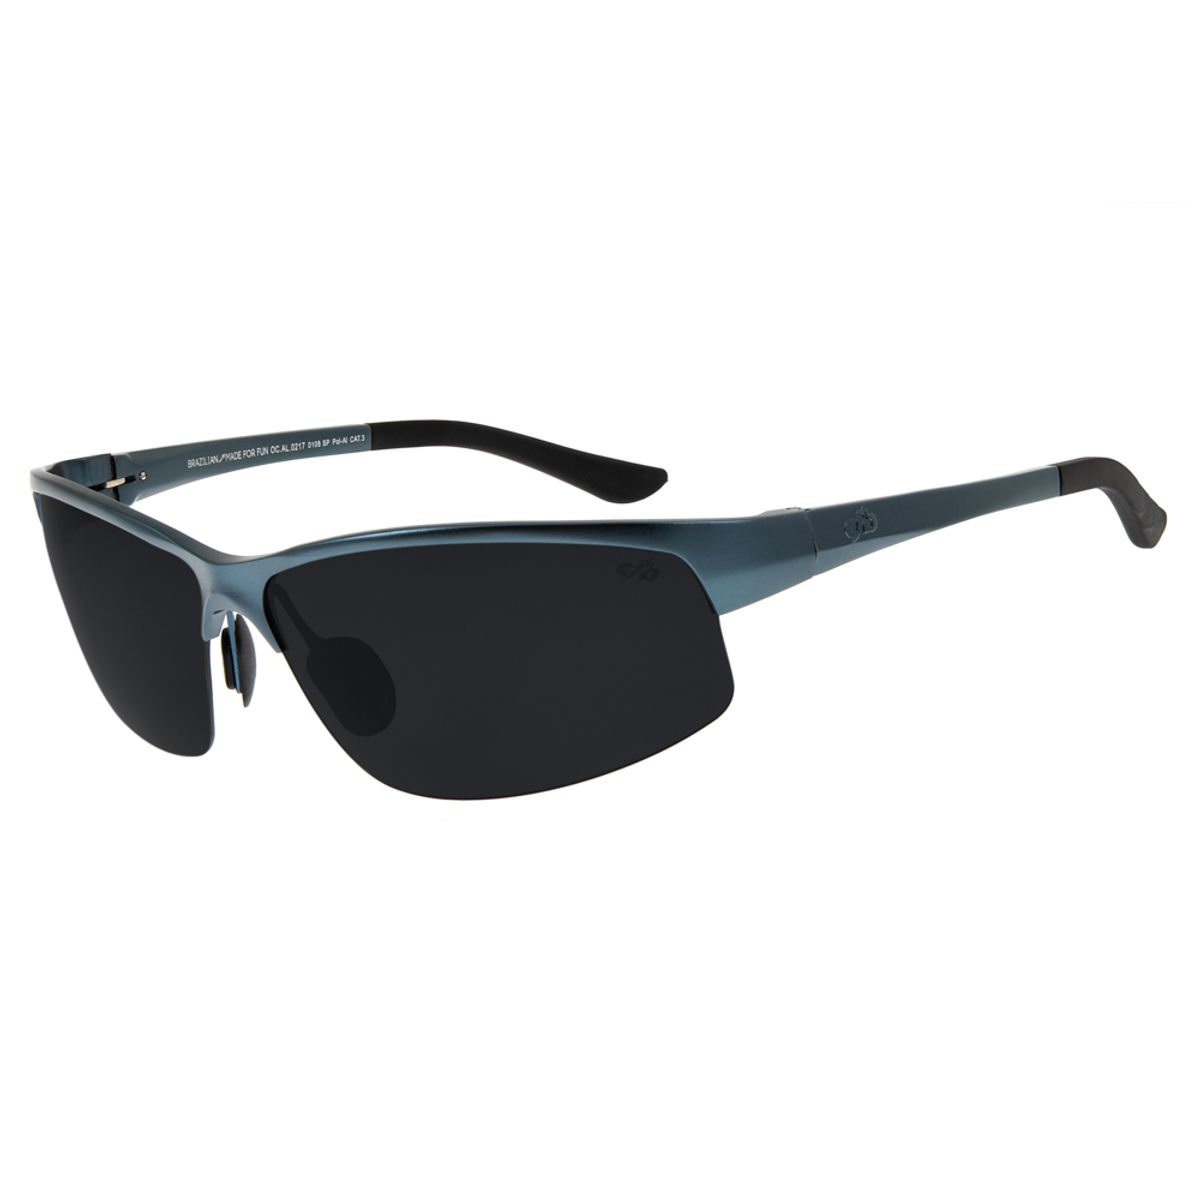 00bf9d138 Óculos de Sol Masculino Chilli Beans Esportivo Alumínio Azul Polarizado -  OC.AL.0217.0108 M. REF: OC.AL.0217.0108. OC.